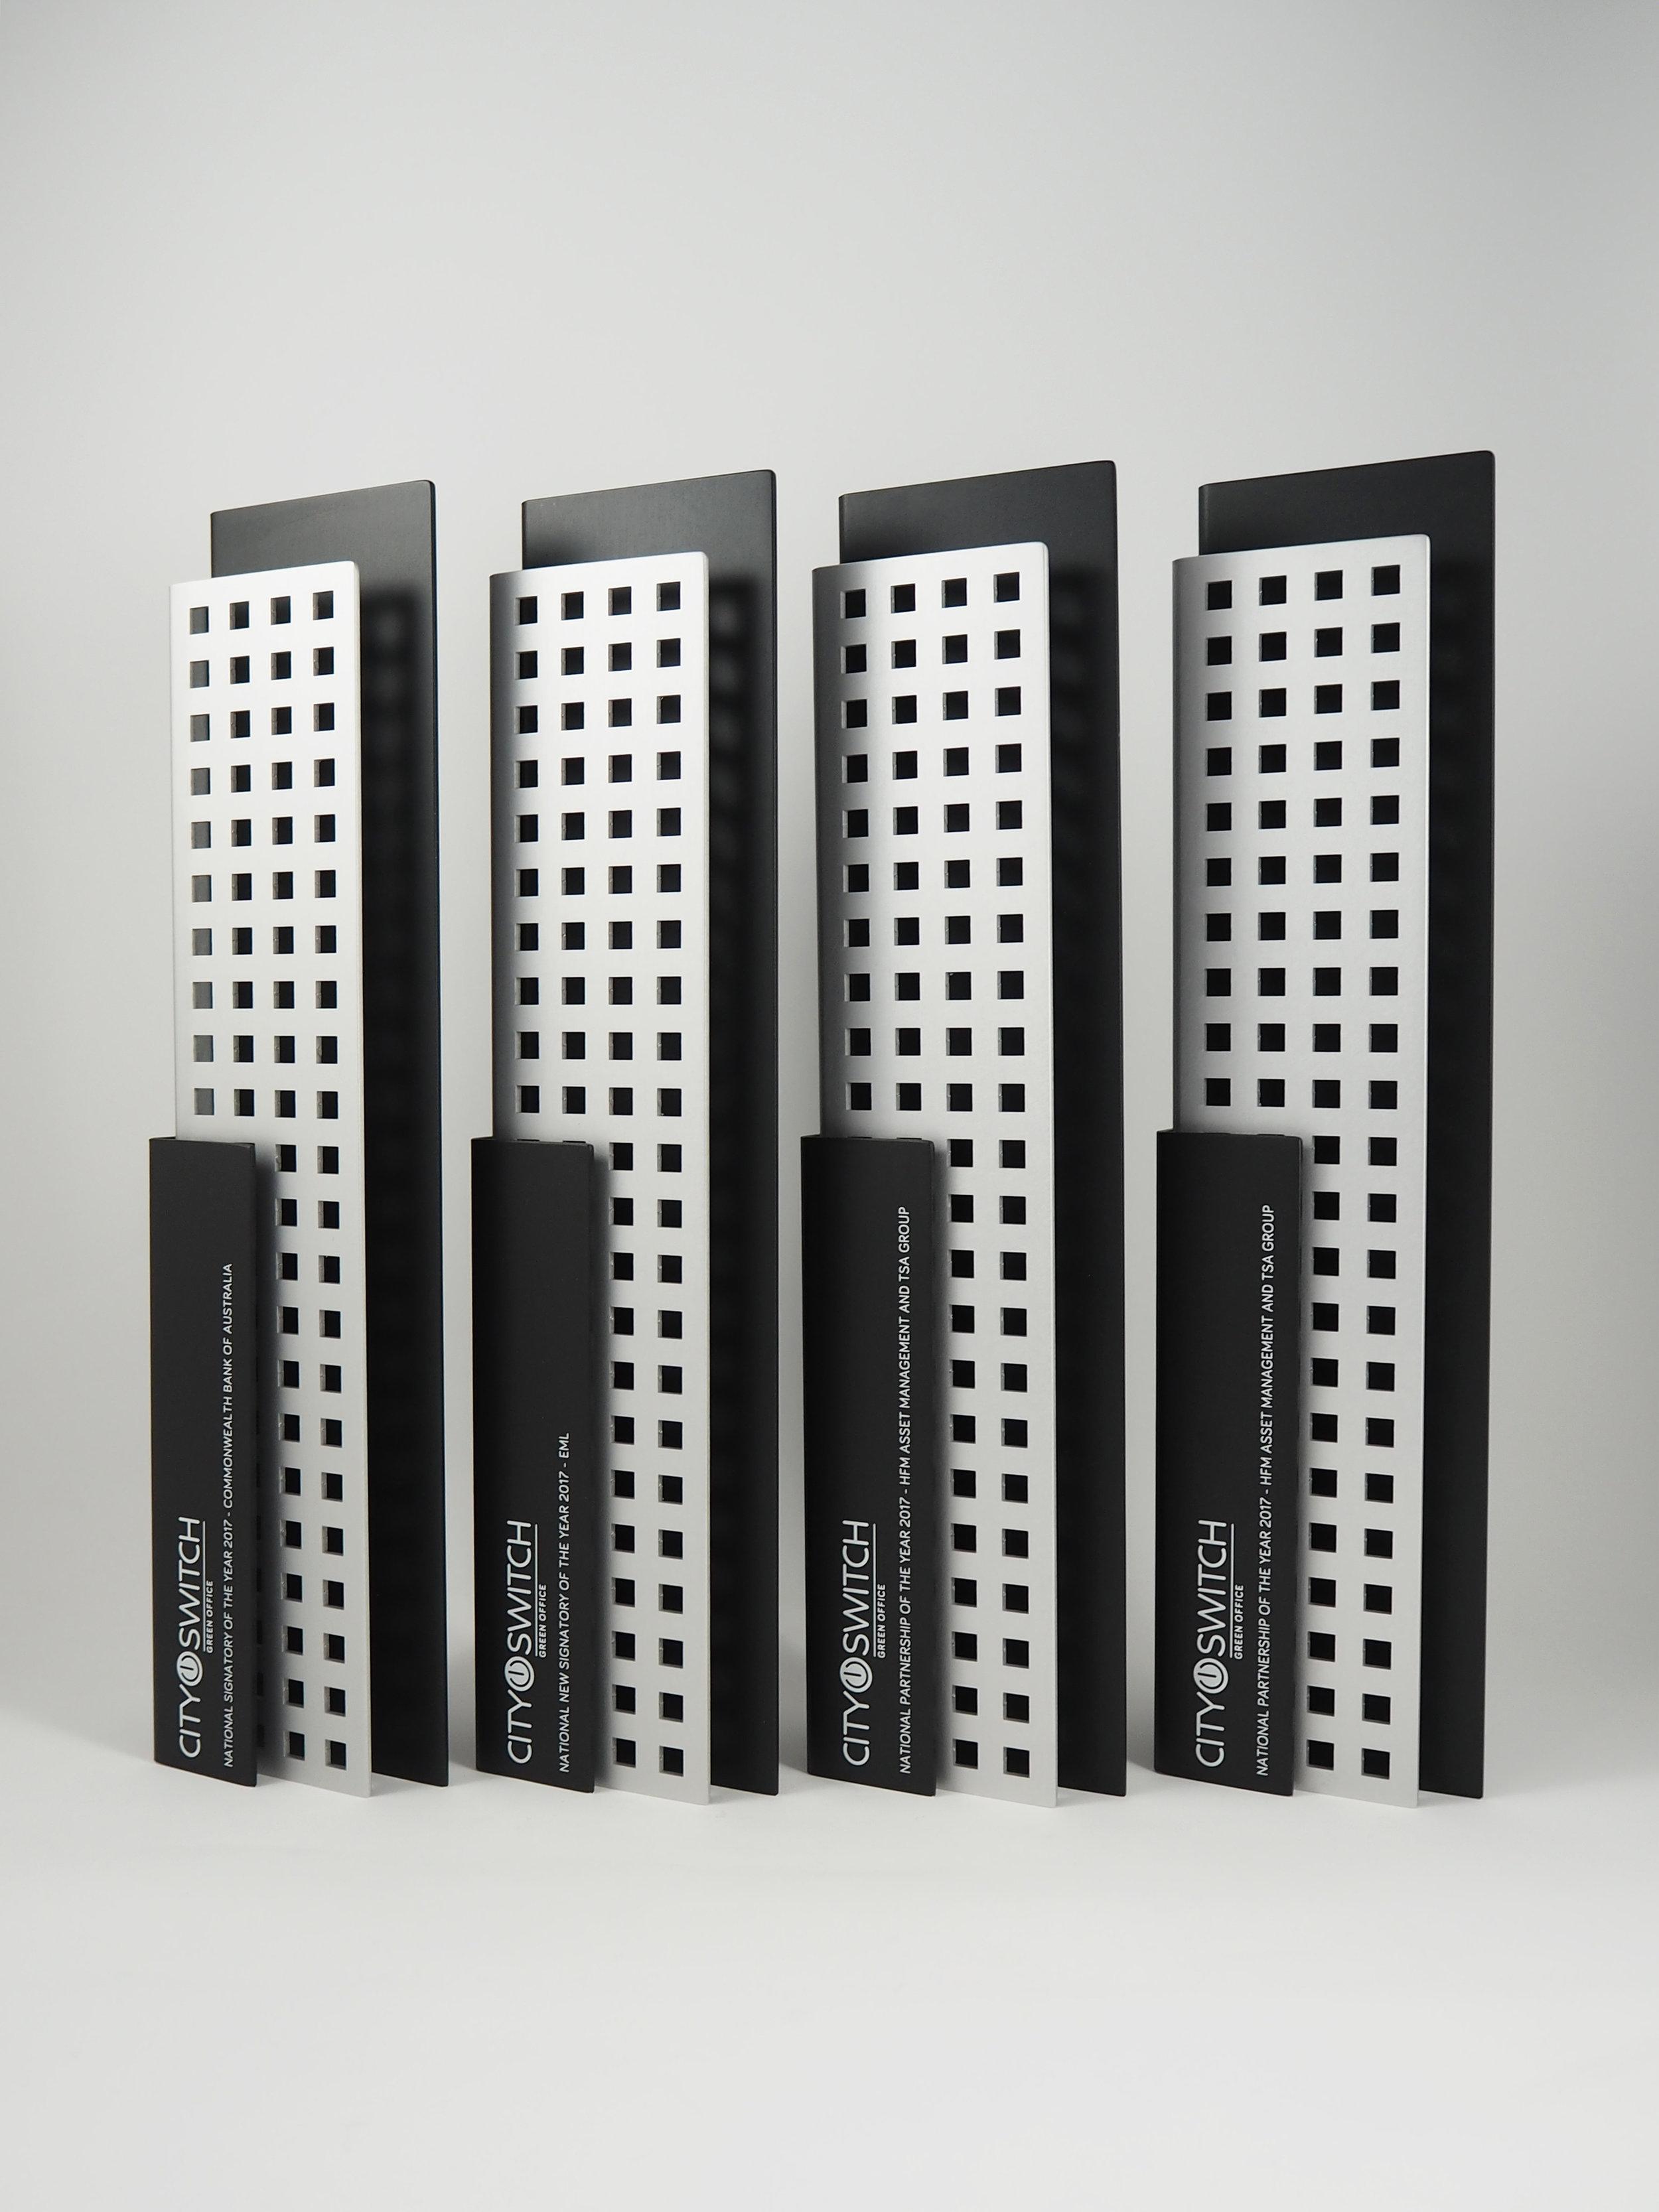 cityswitch-aluminium-corporate-trophy-award-05.jpg